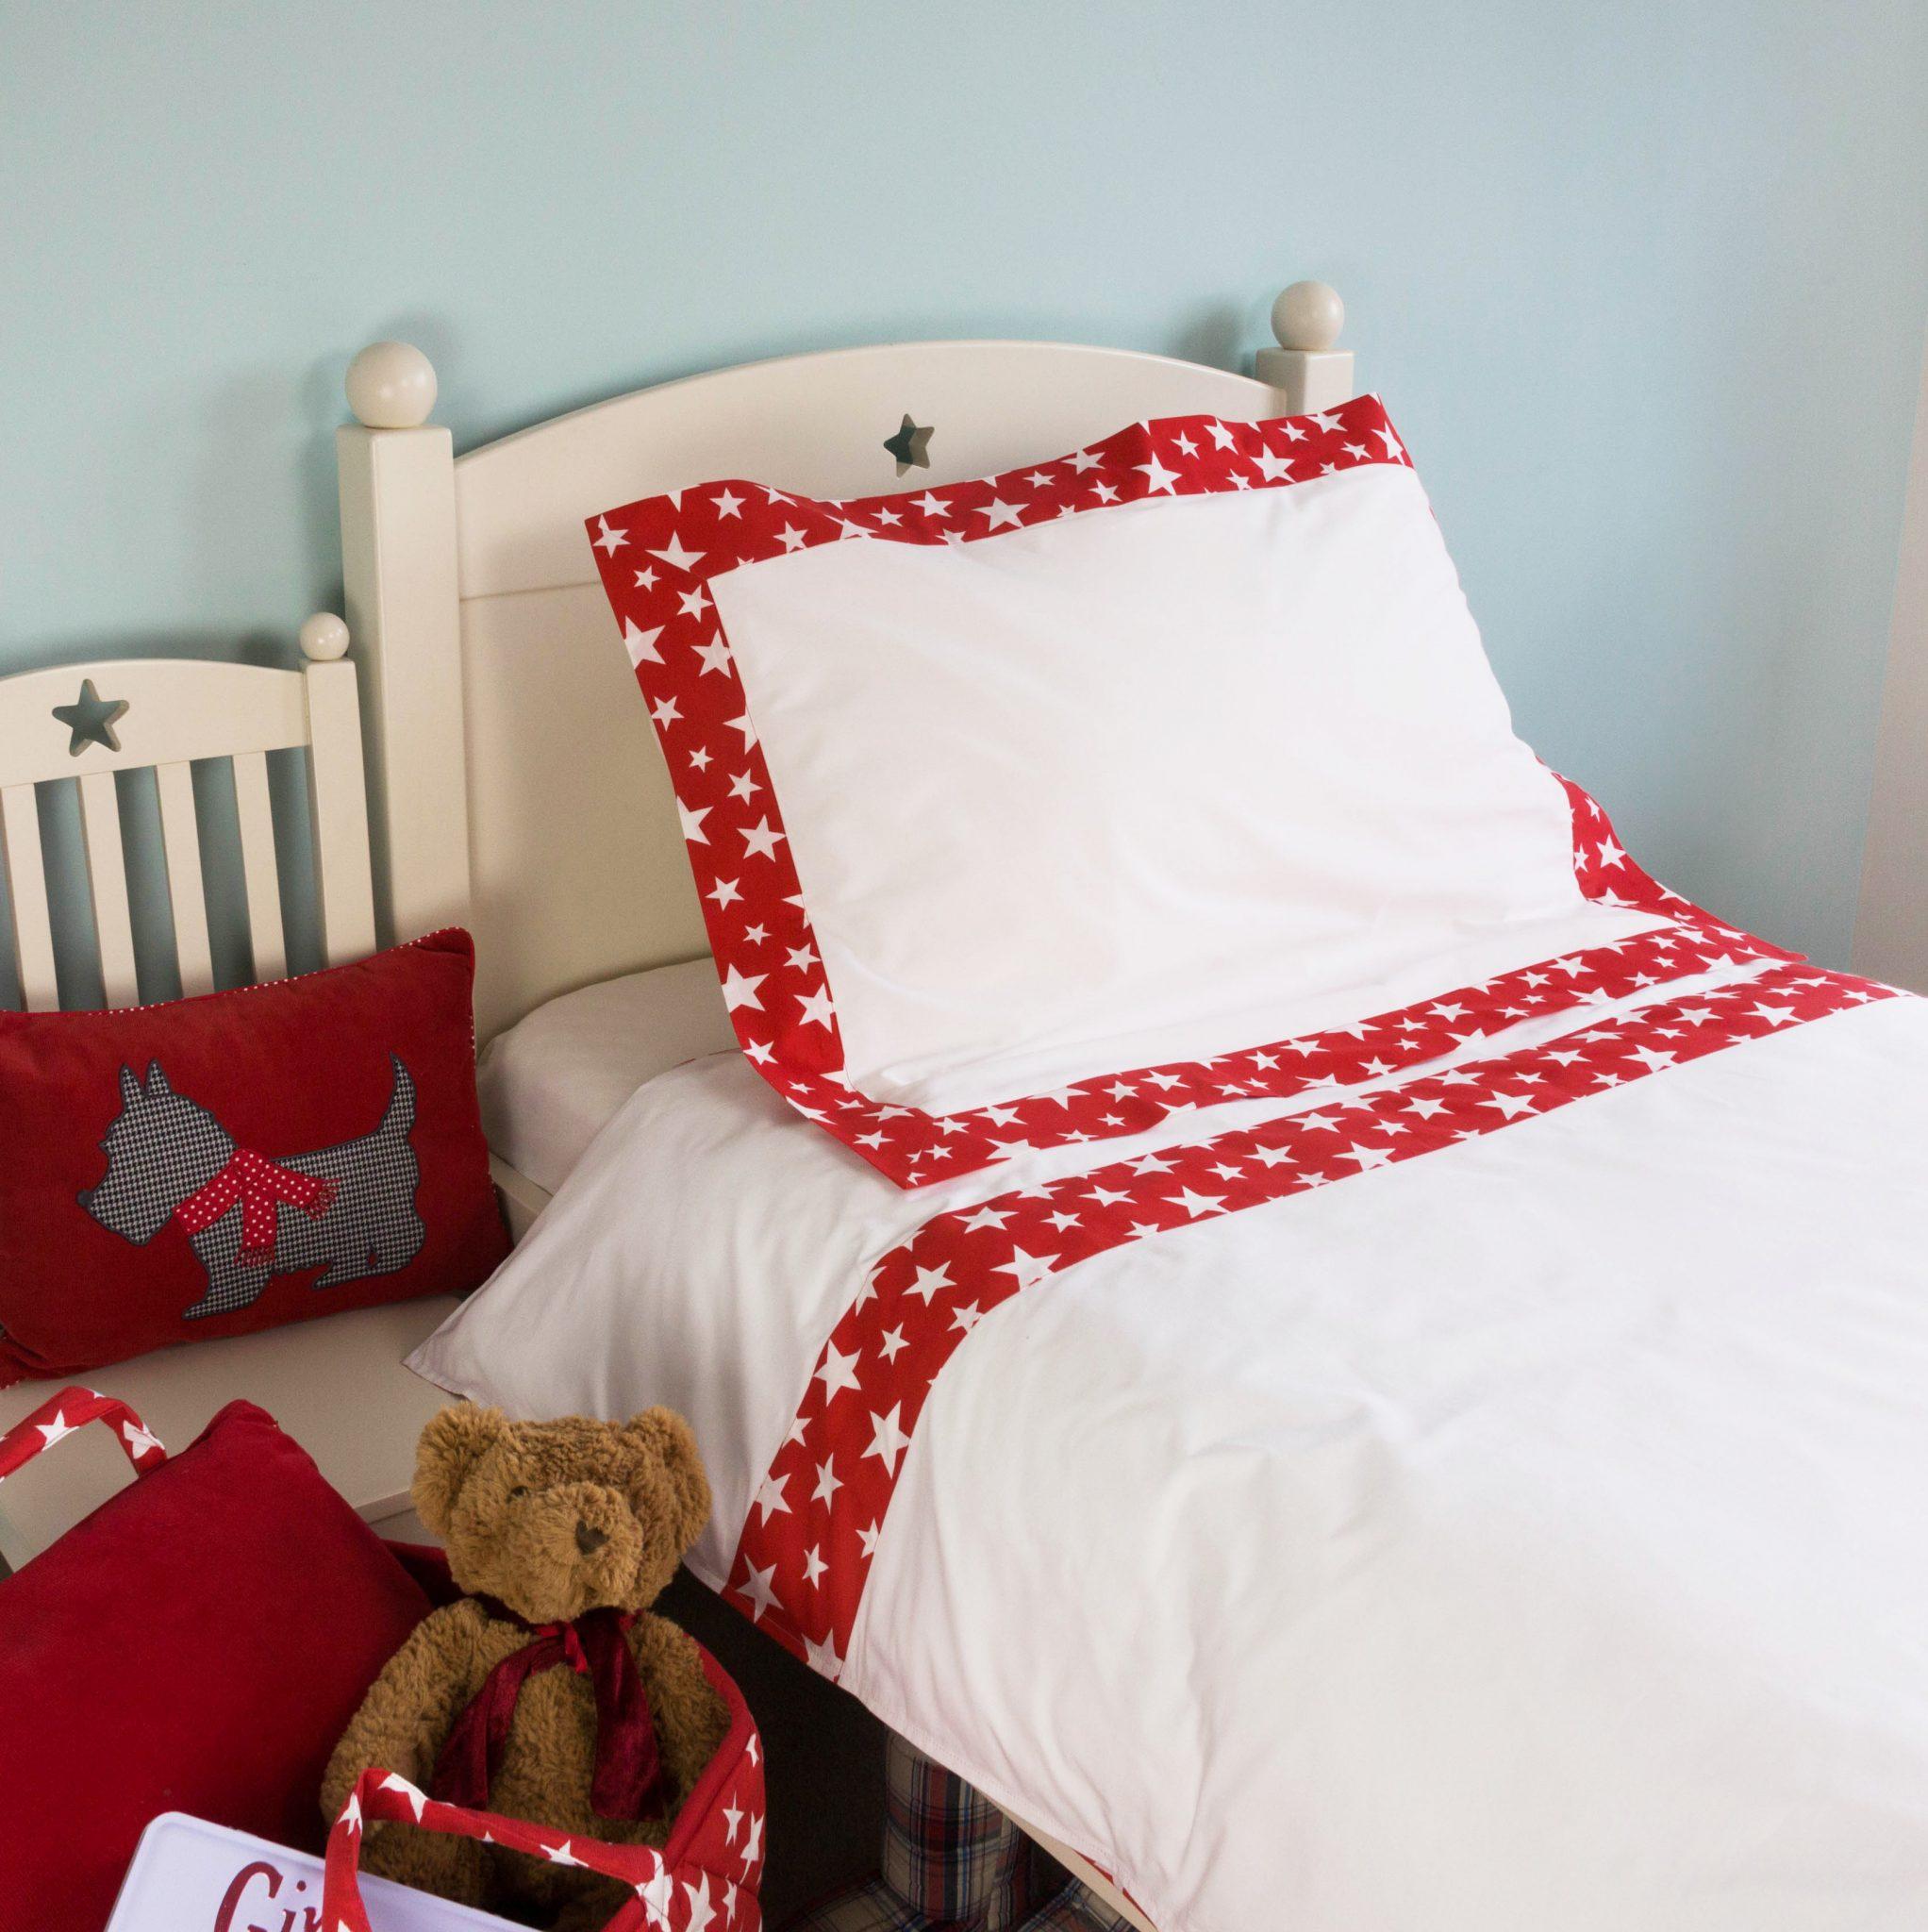 Kiddiewinkles Personalised Children's Red Star Bedding Set